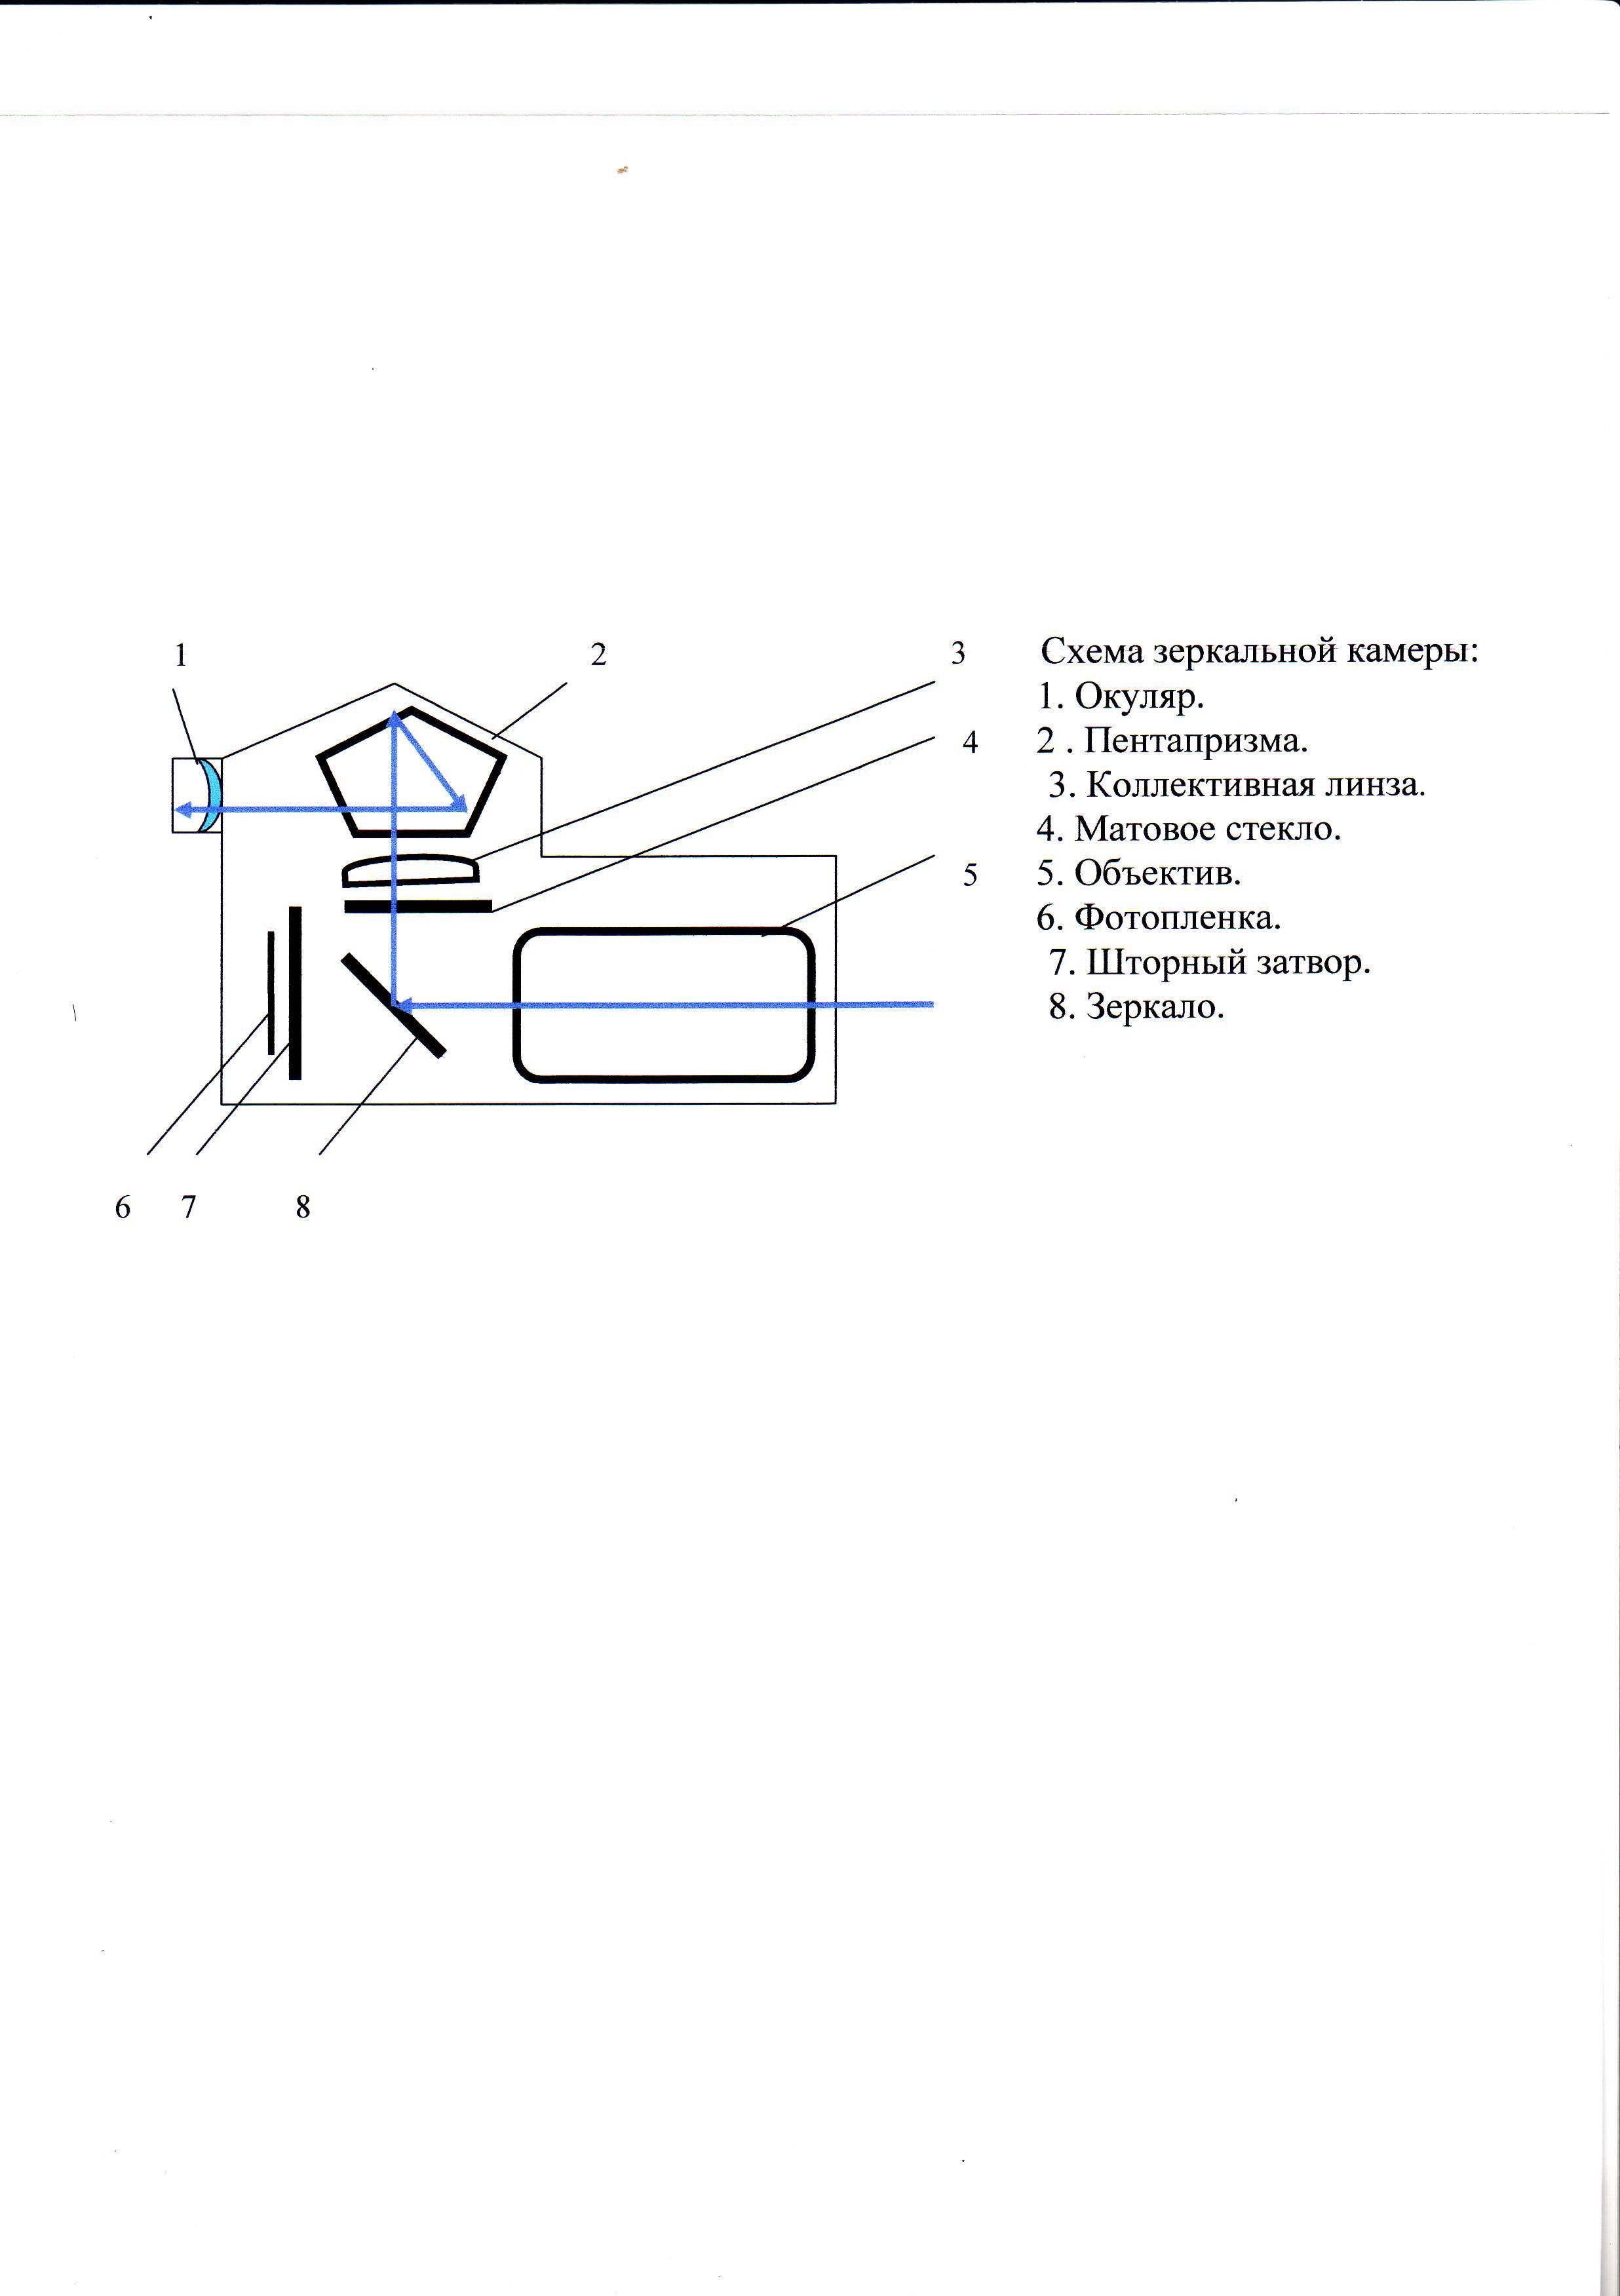 h презентацию на тему лазеры 11 класс физика